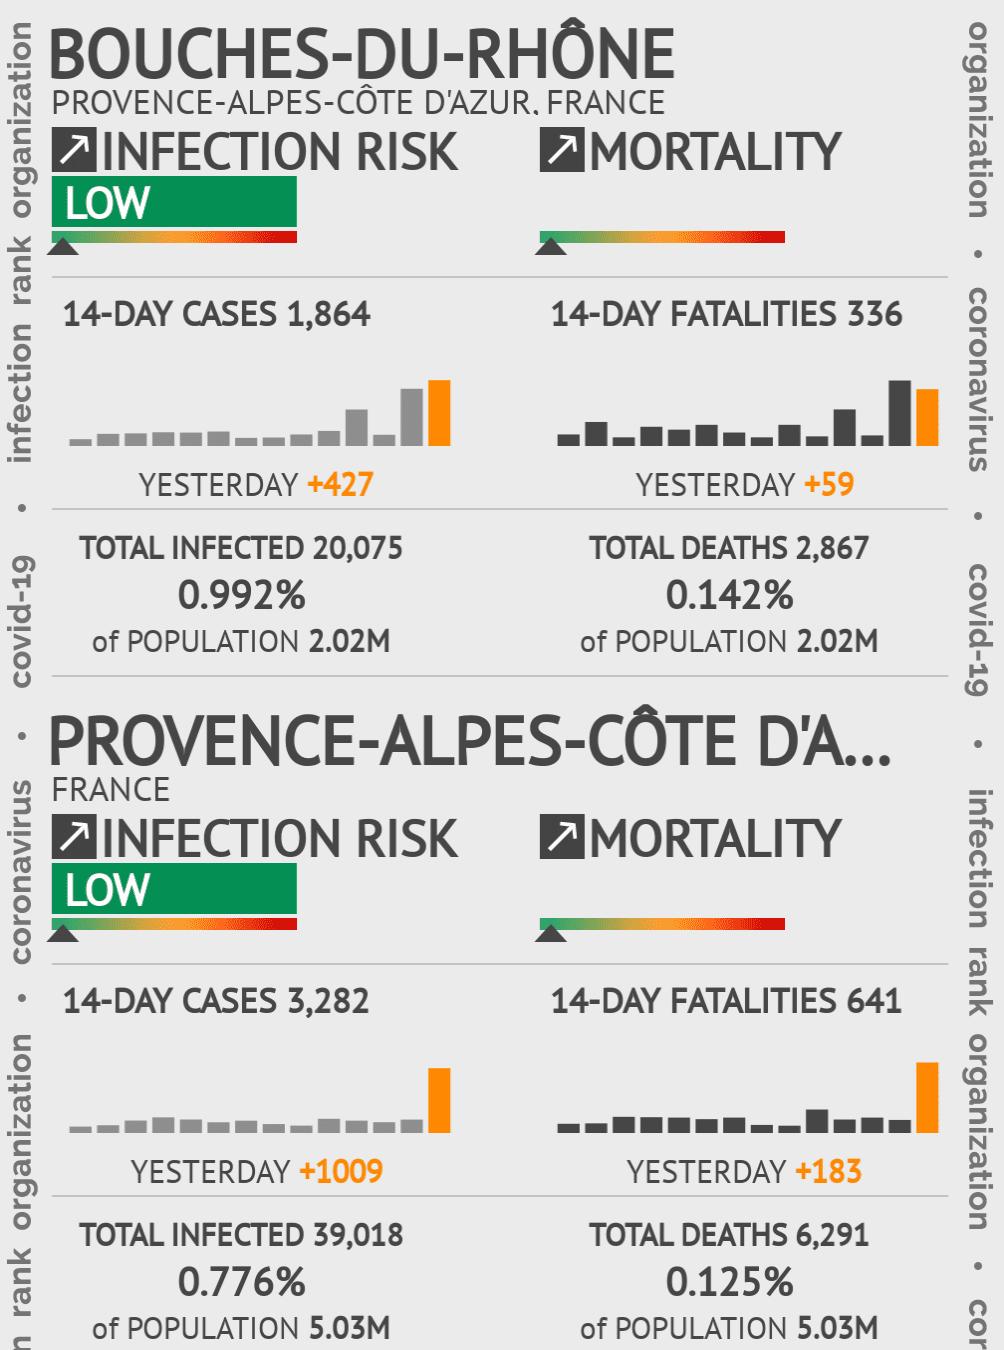 Bouches-du-Rhône Coronavirus Covid-19 Risk of Infection on March 06, 2021